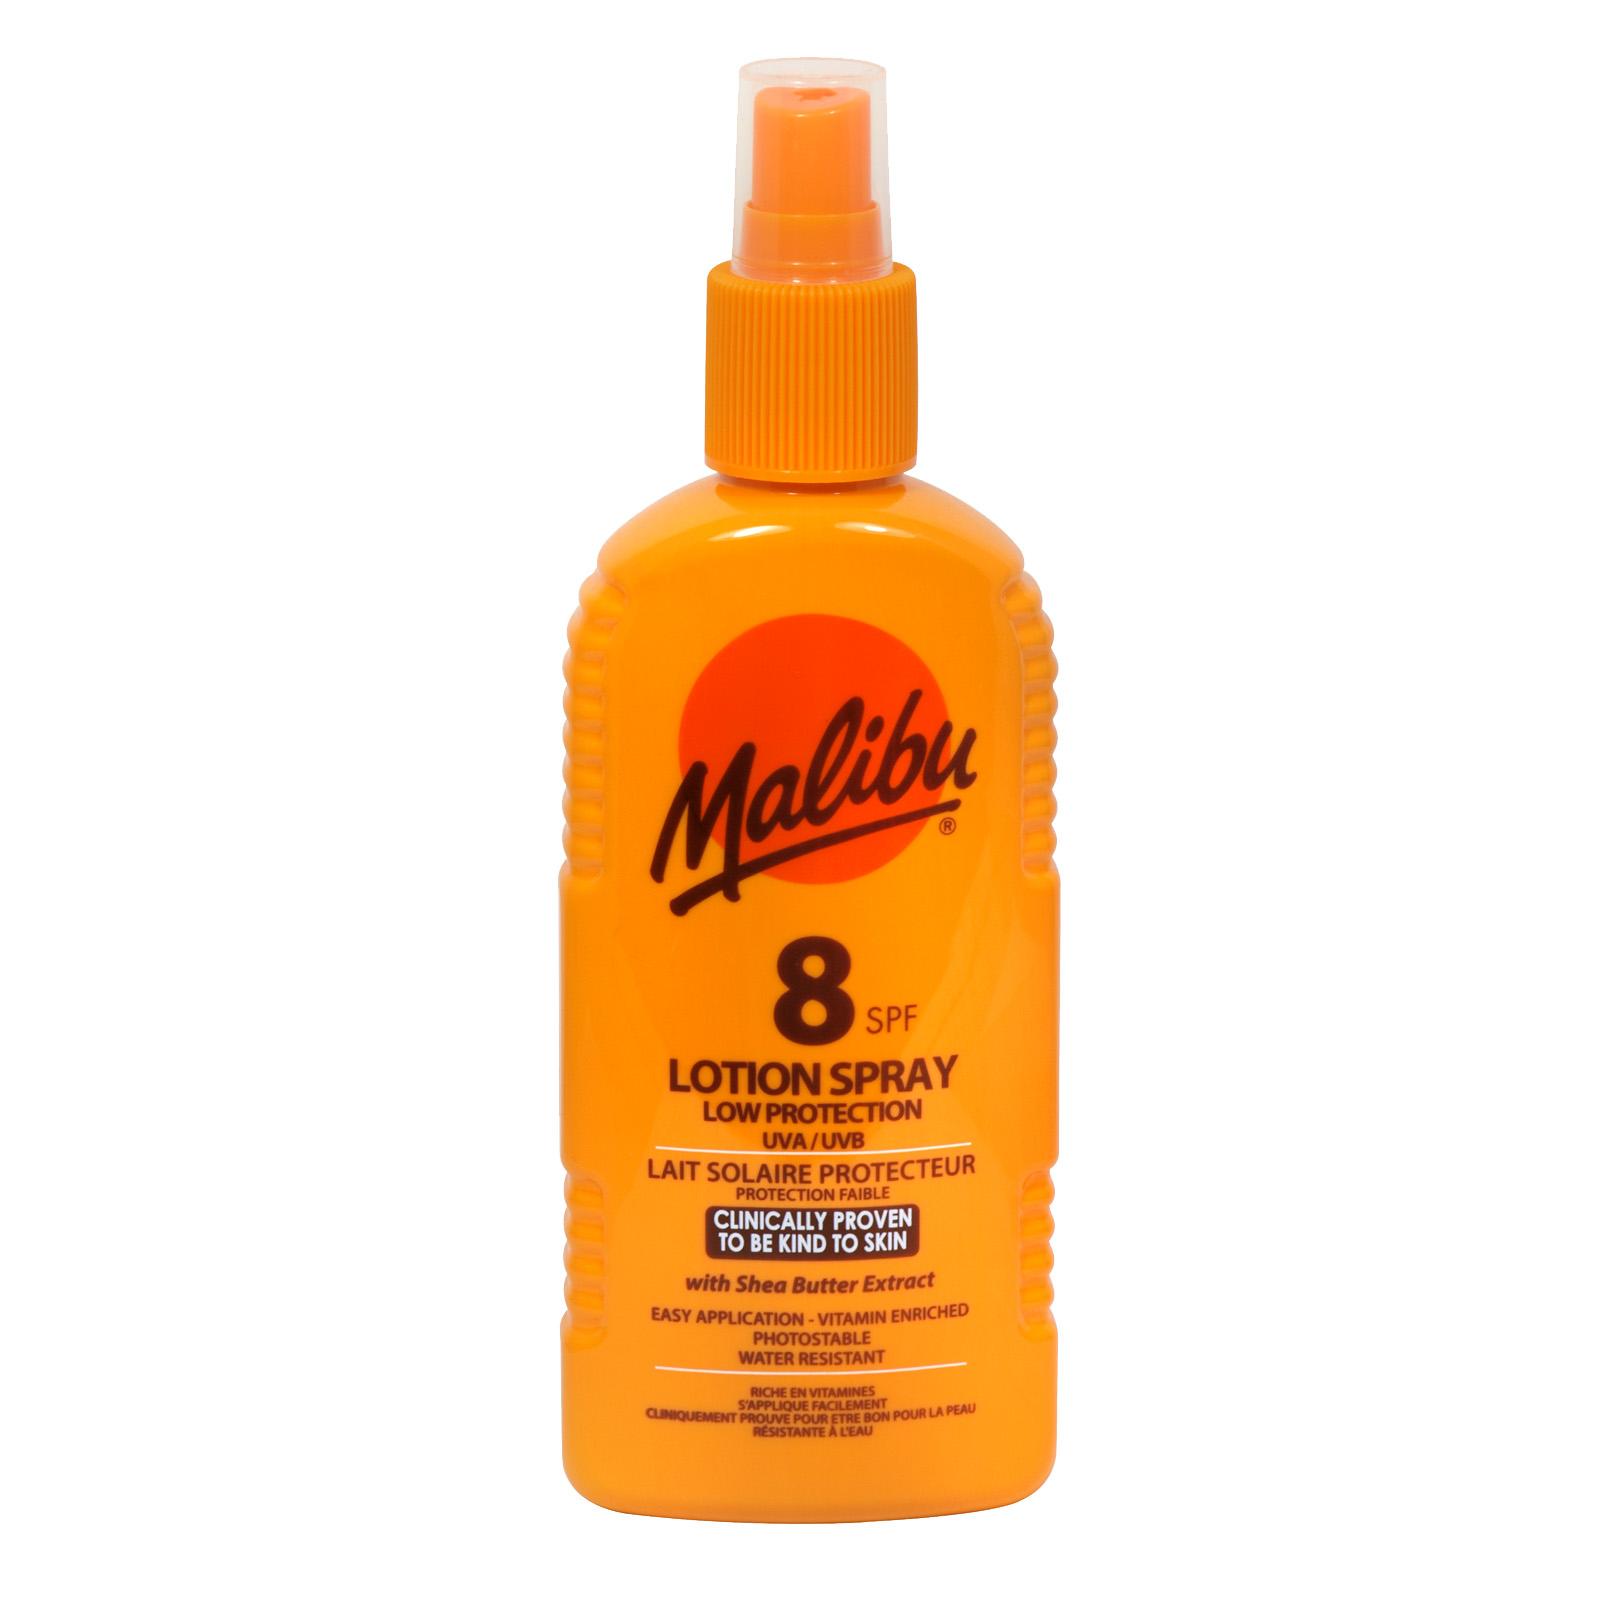 MALIBU LOTION SPRAY 200ML SPF8 X6